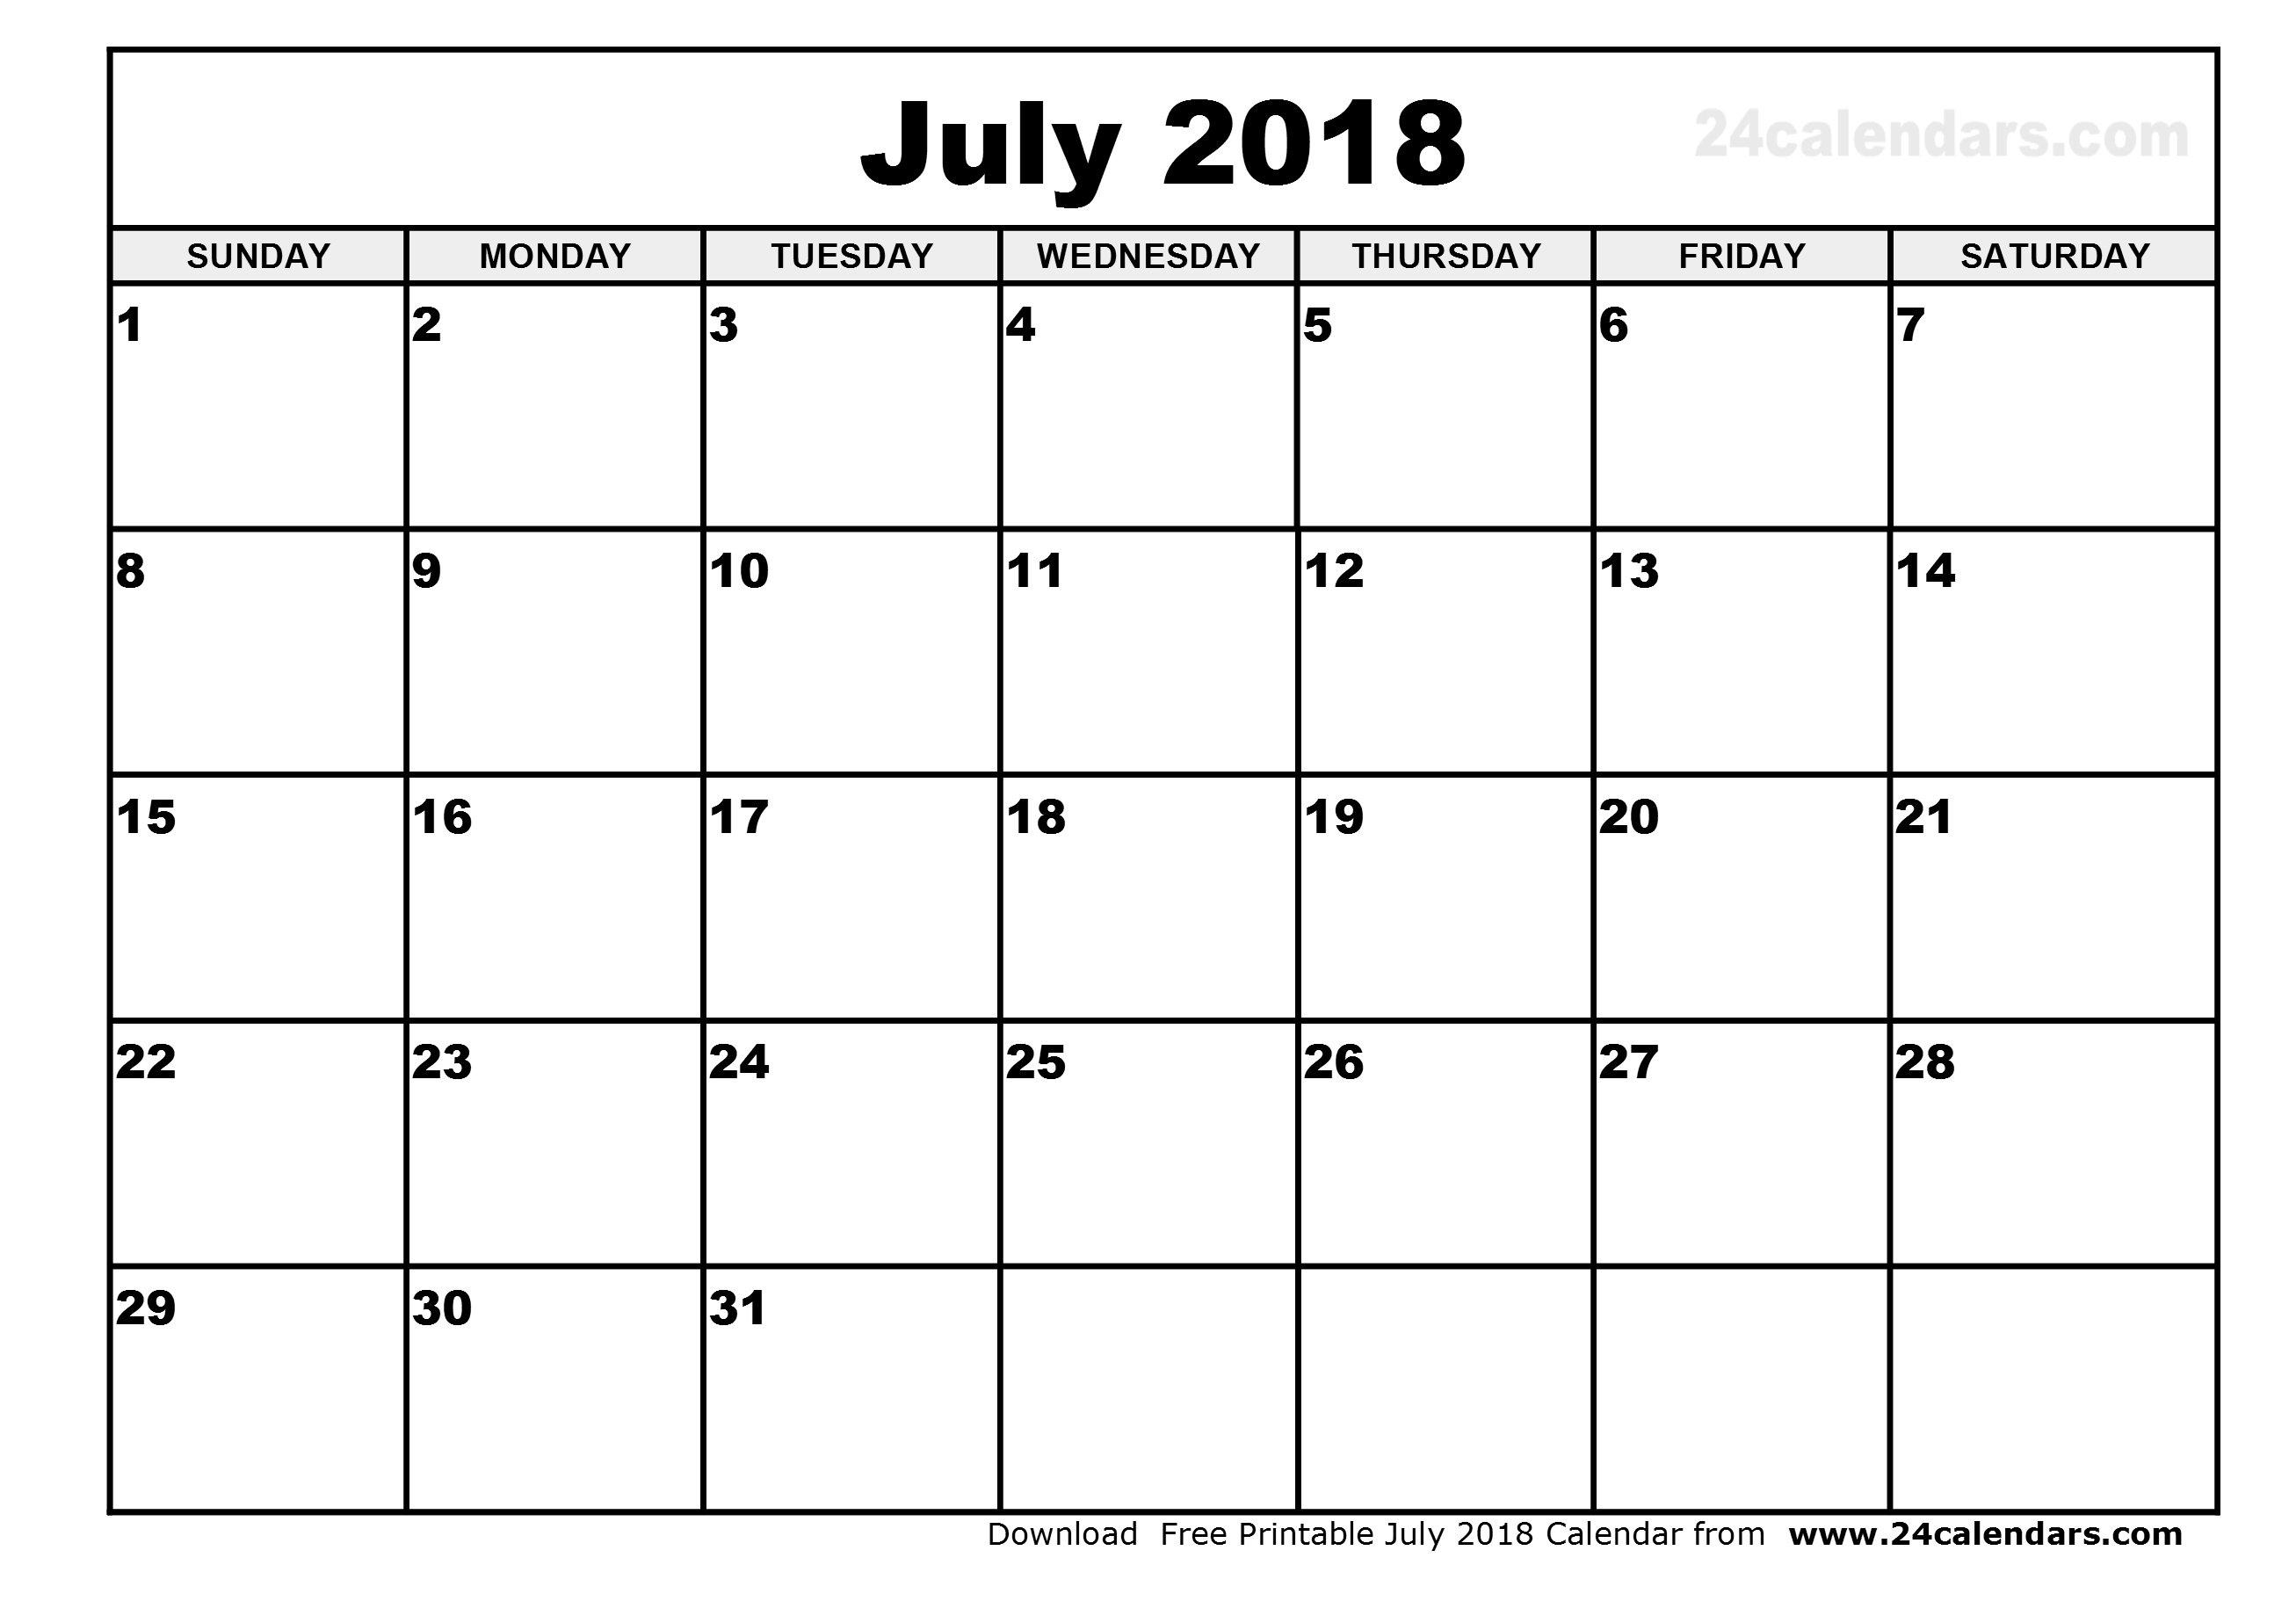 Printable Calendar July 2018 Cute Larissanaestrada 89uj